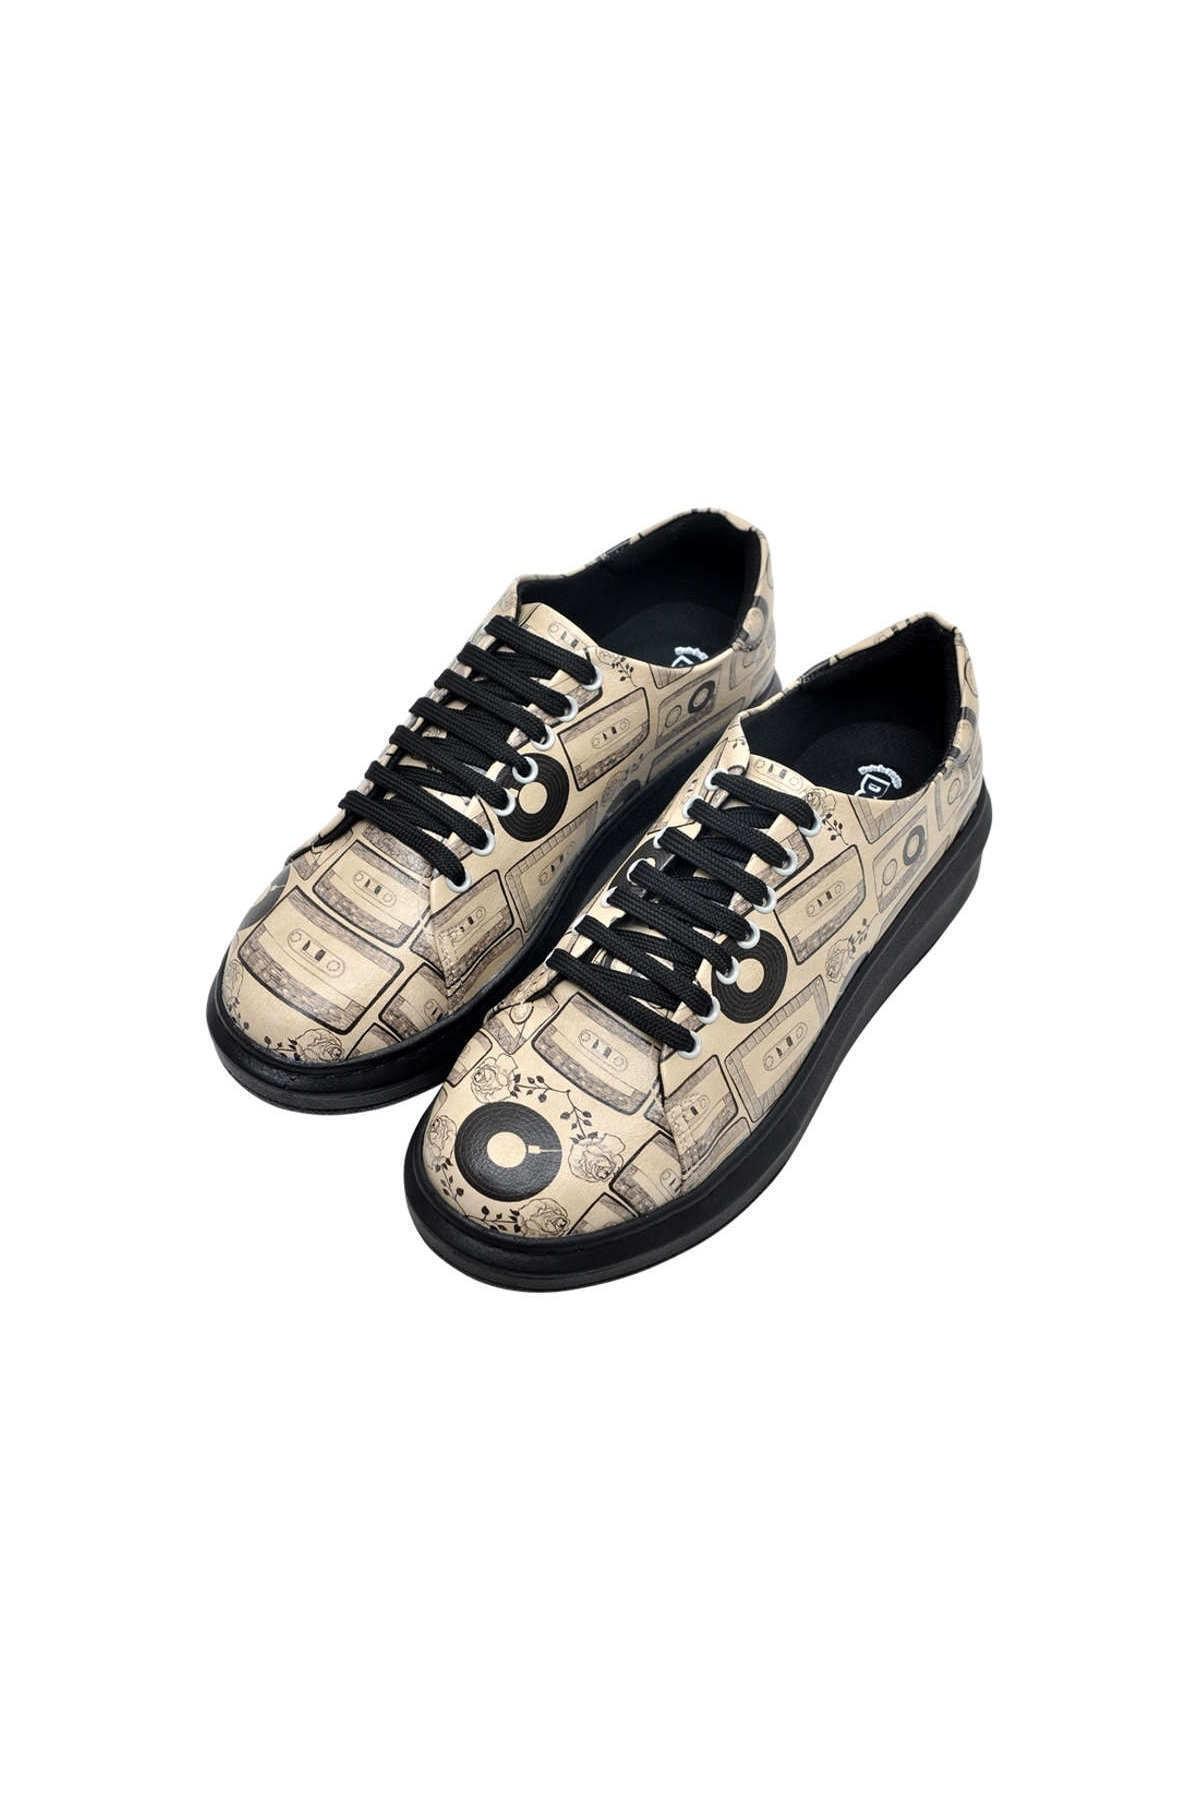 Dogo Can You Hear The Sounds Kadın Sneaker 1